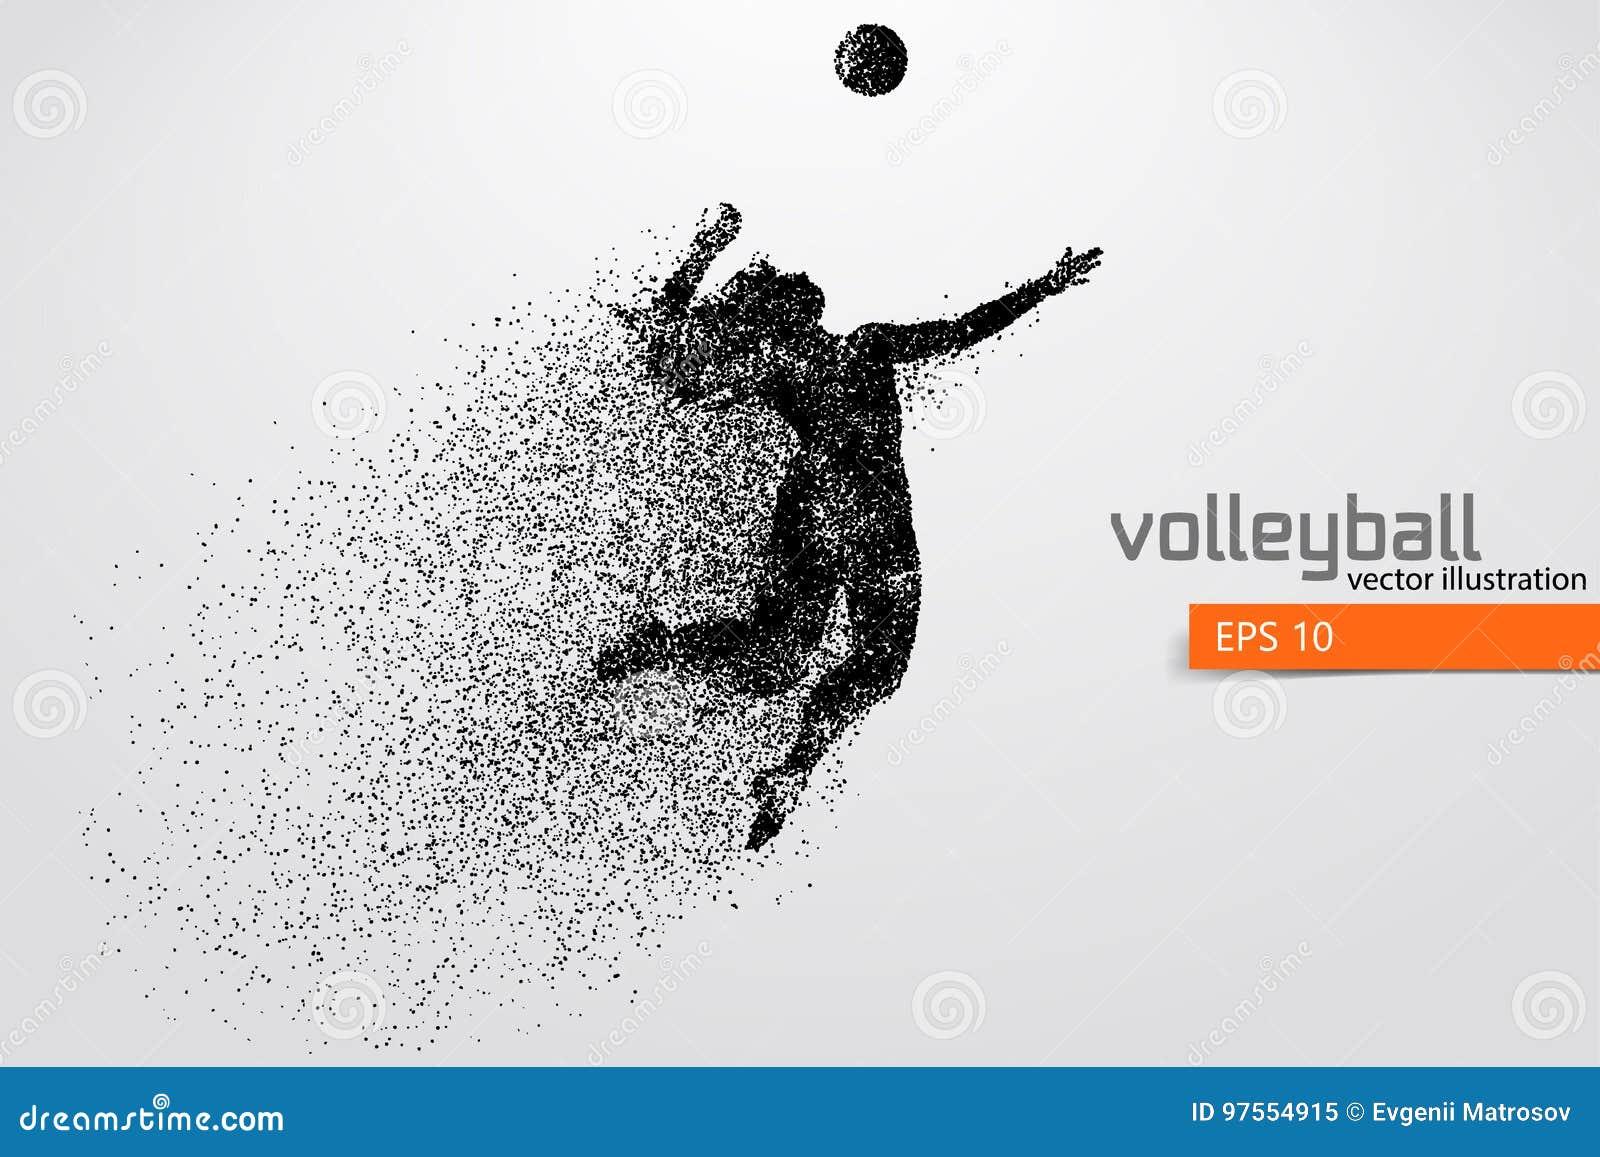 Silueta del jugador de voleibol